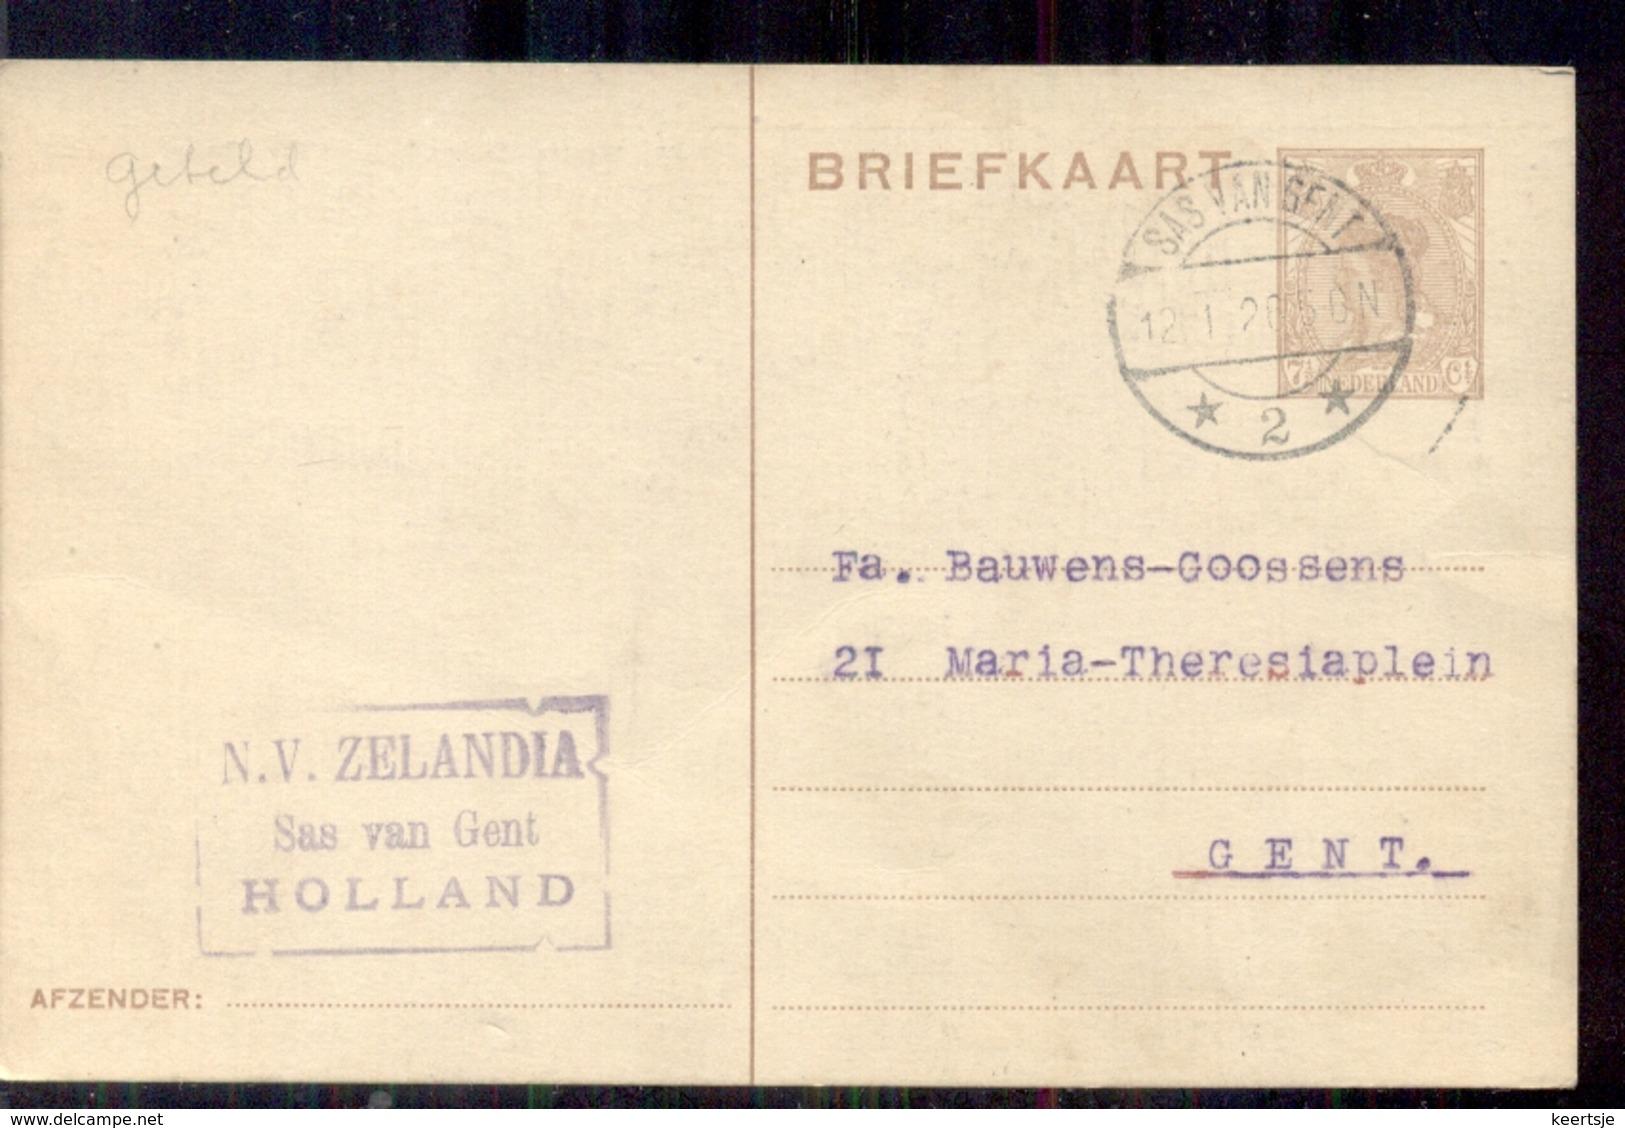 Sas Van Gent - N V Zelandia - 1920 - Ganzsachen